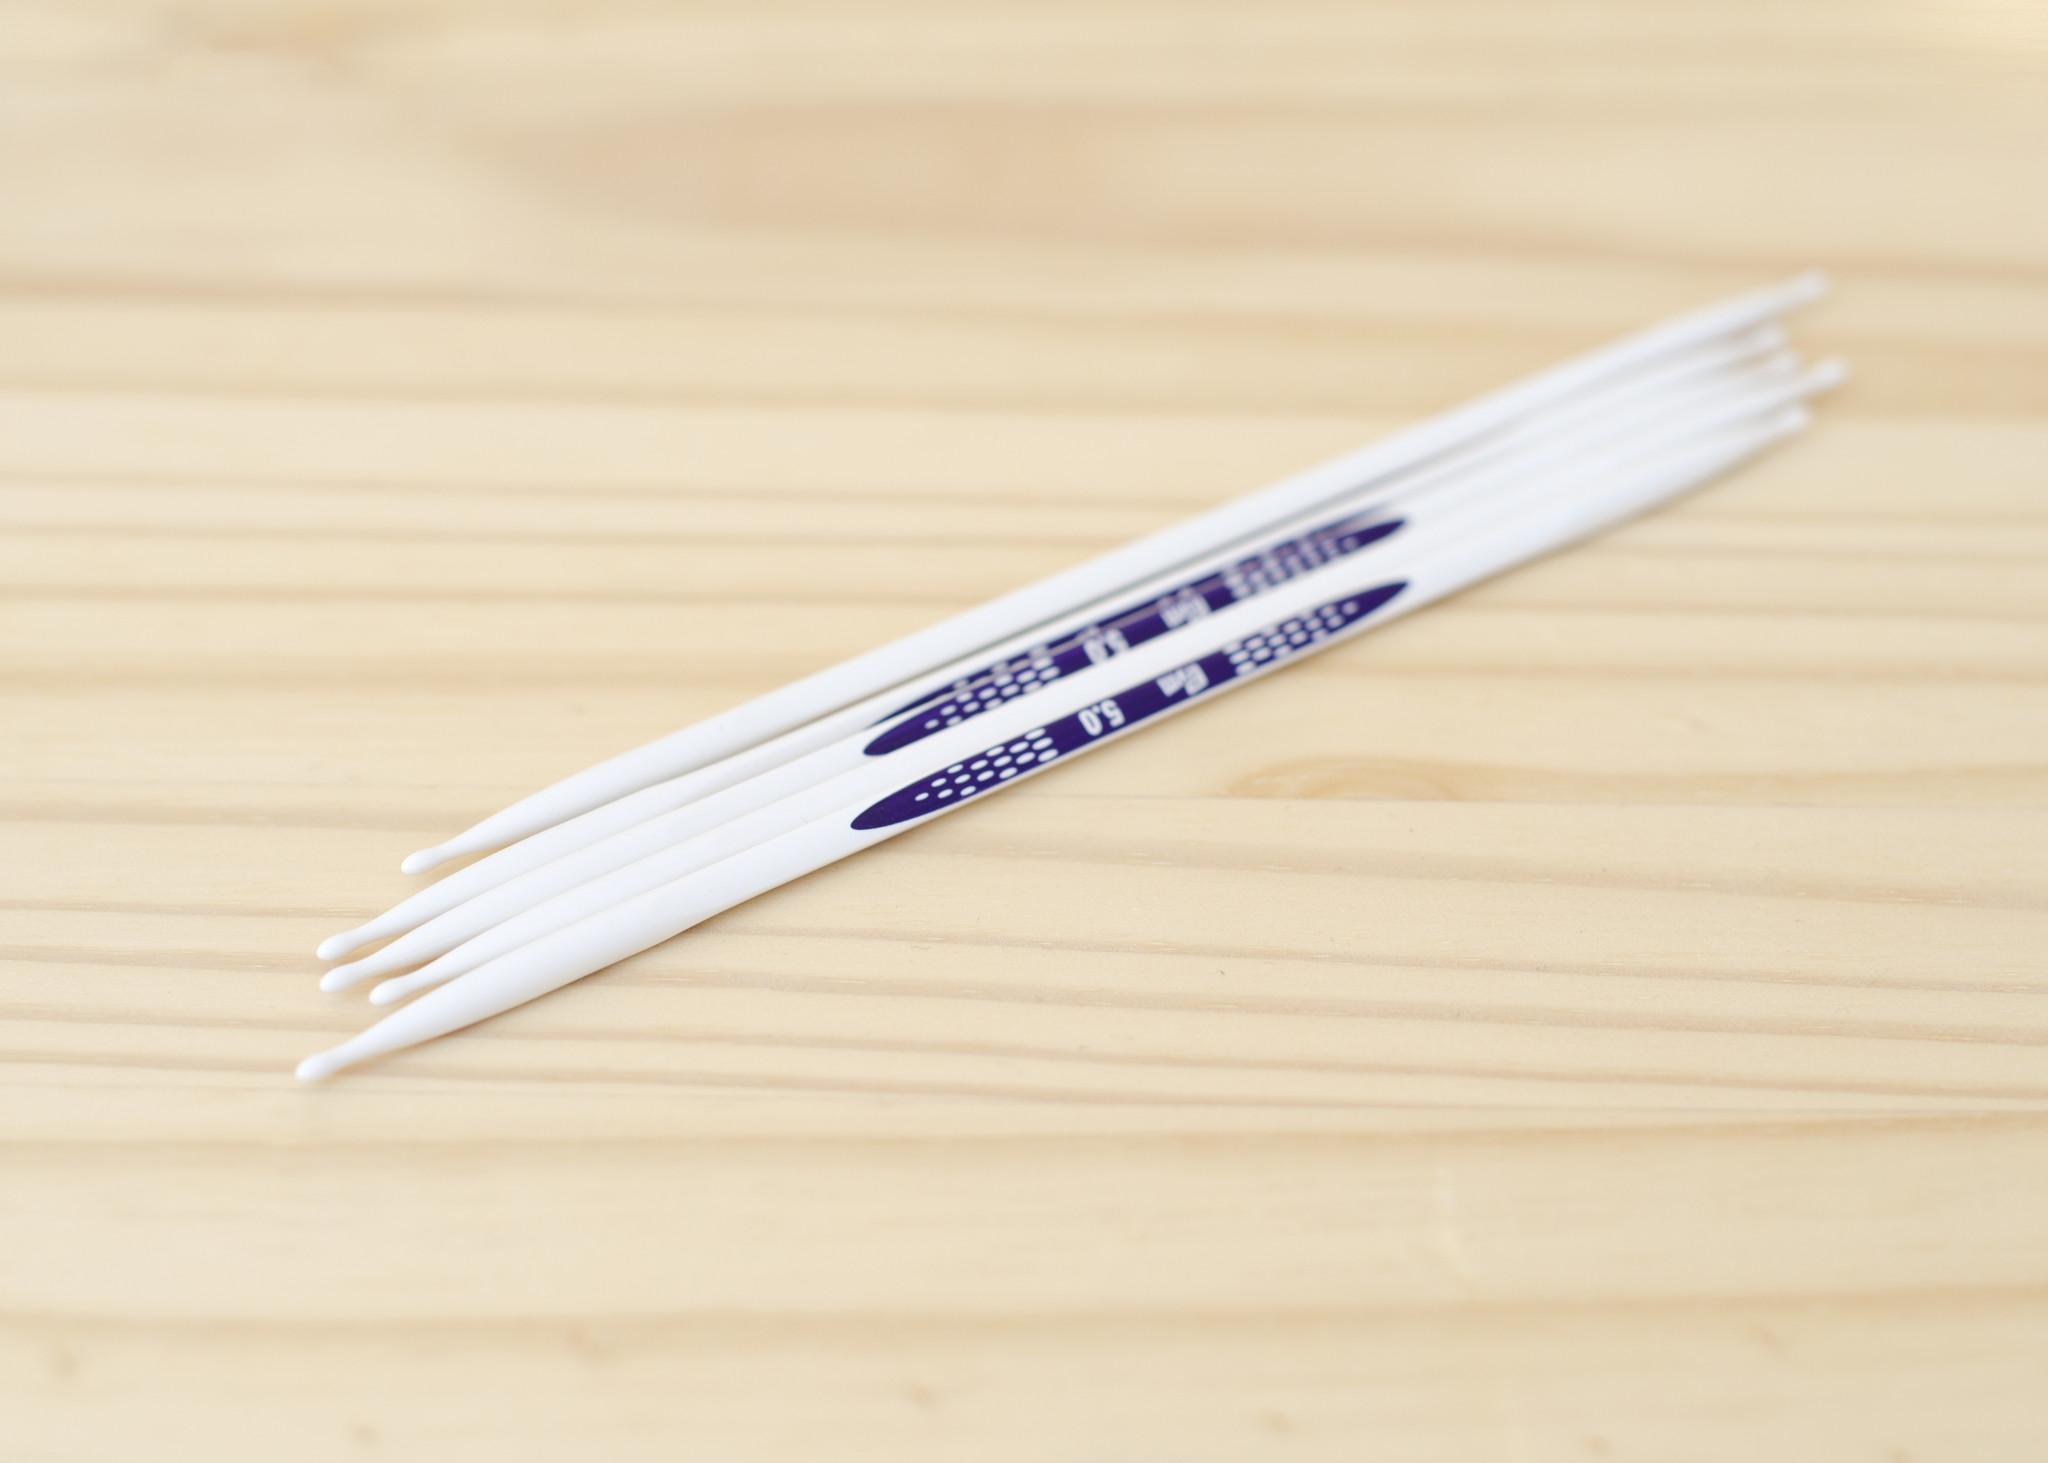 Prym : Ergonomic Double Pointed Needles : 5mm